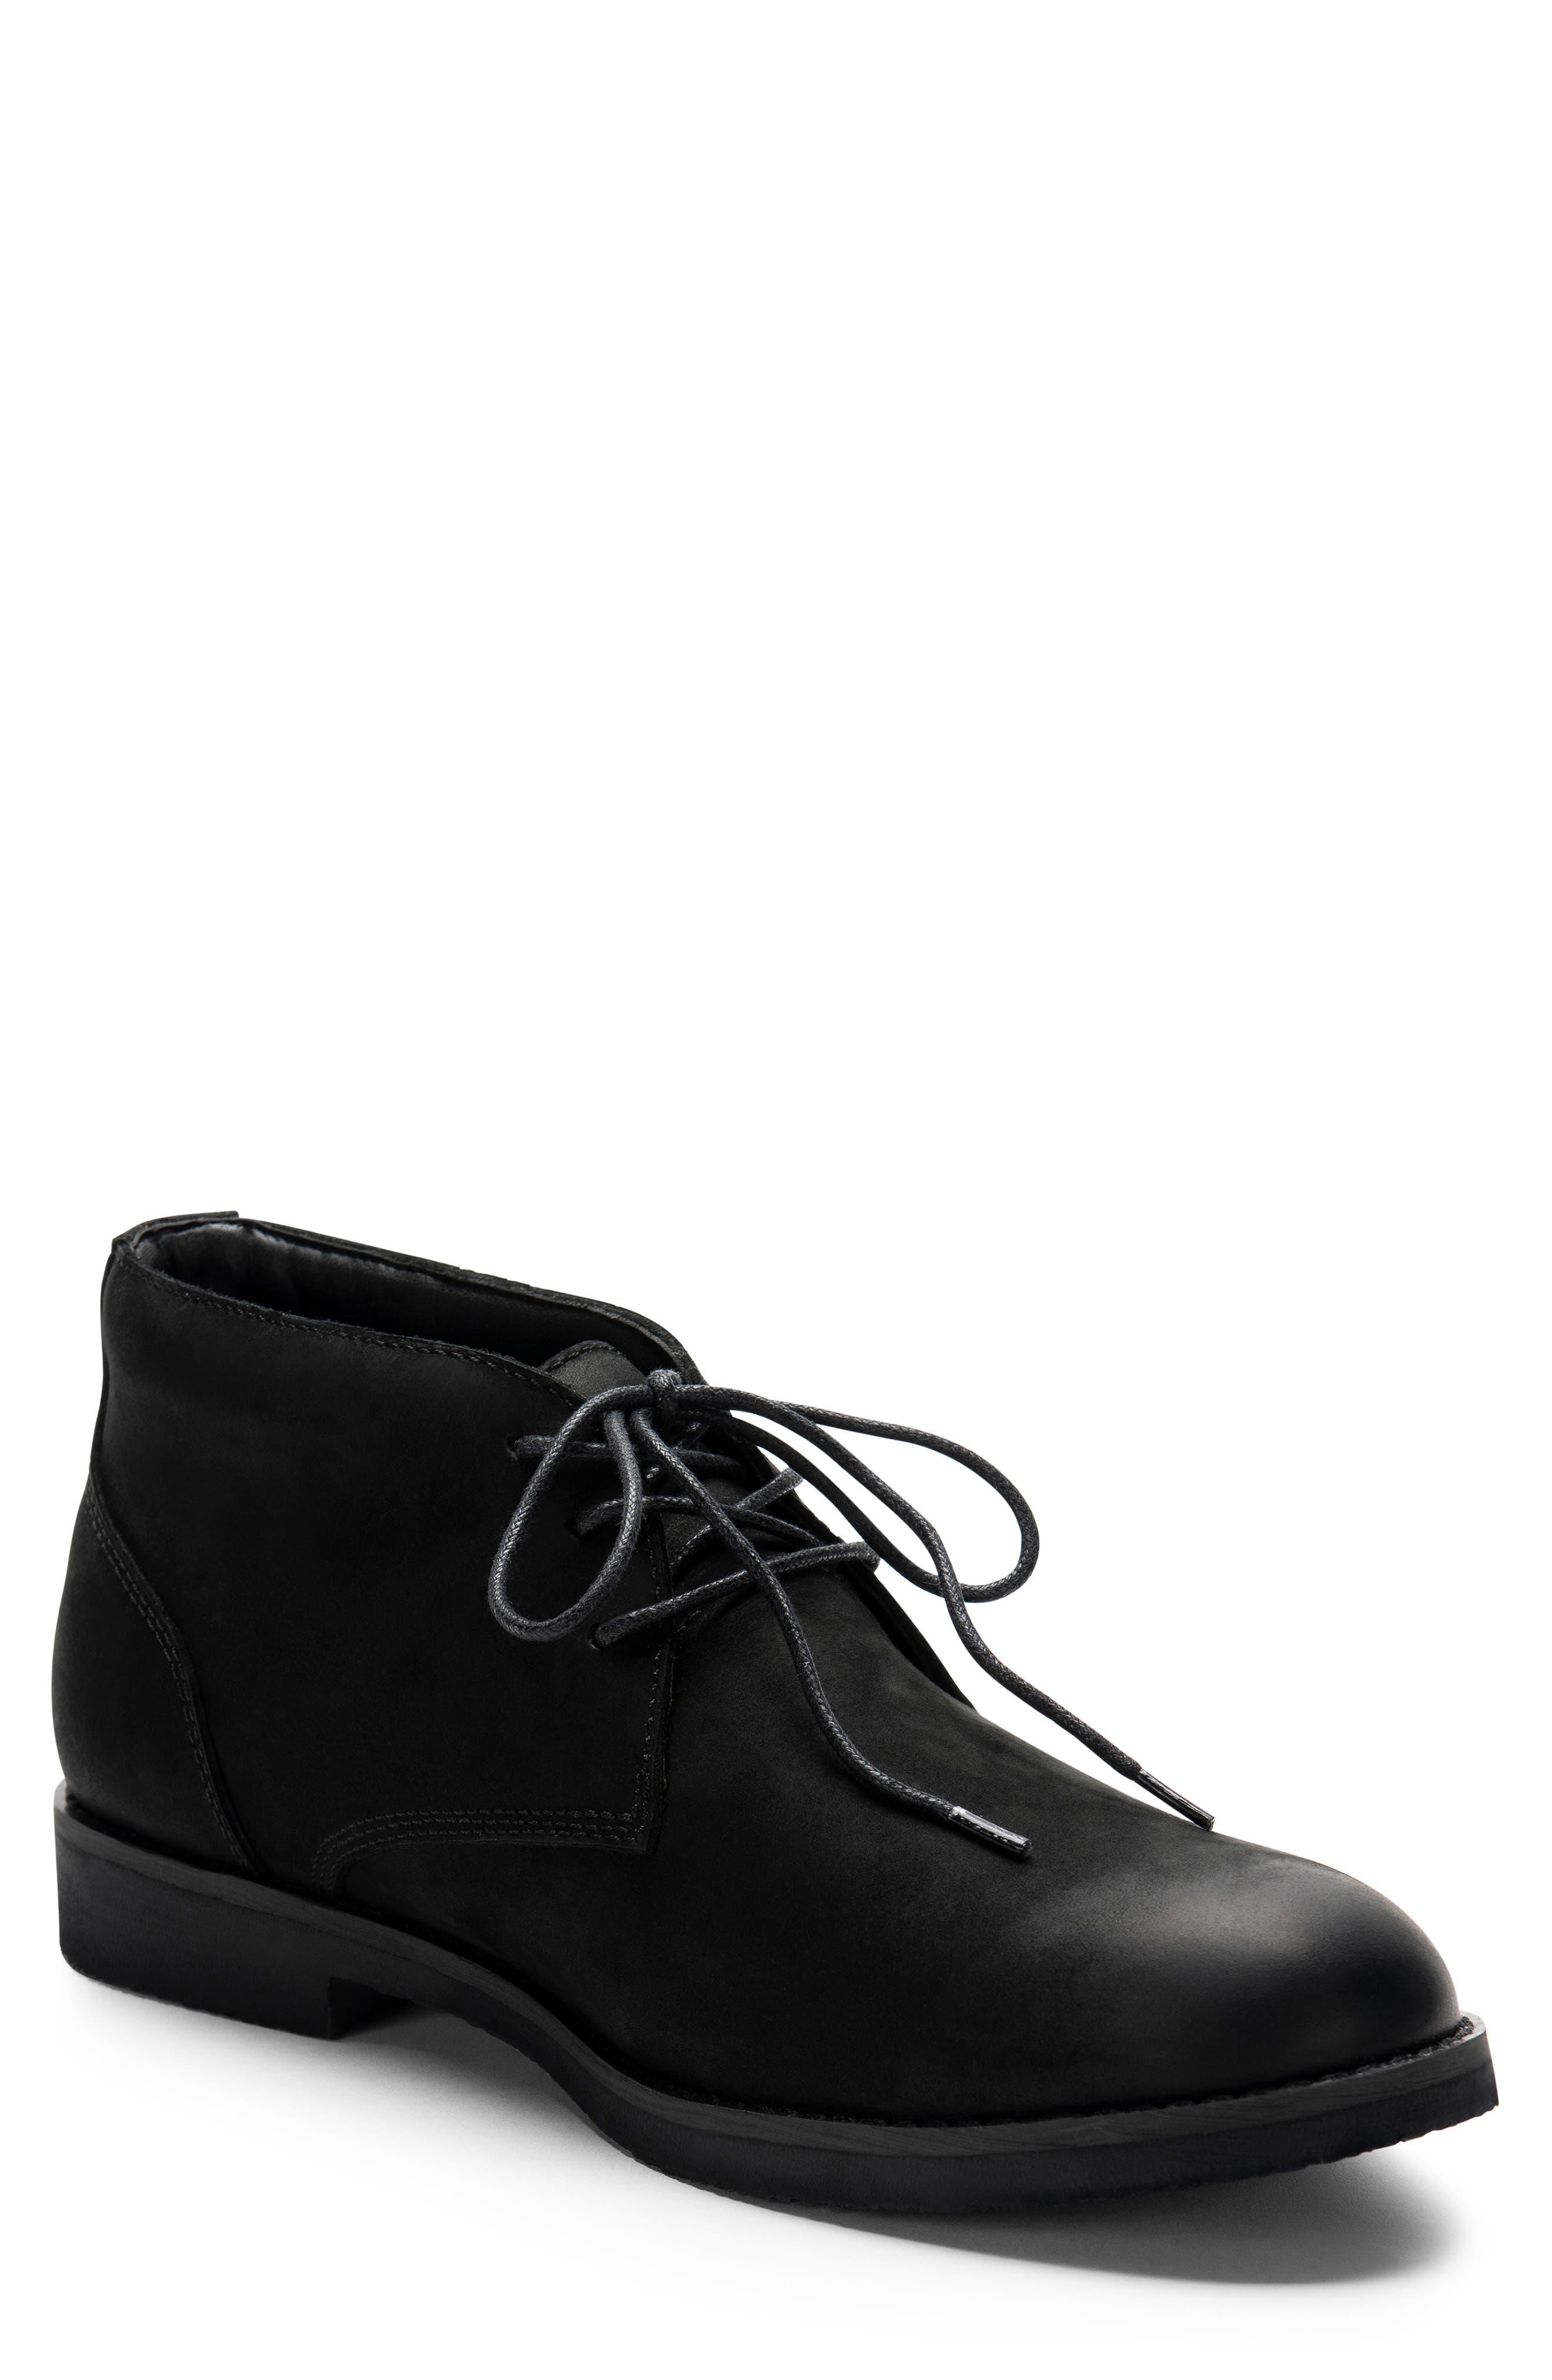 Gary Waterproof Chukka Boot,                         Main,                         color, BLACK NUBUCK